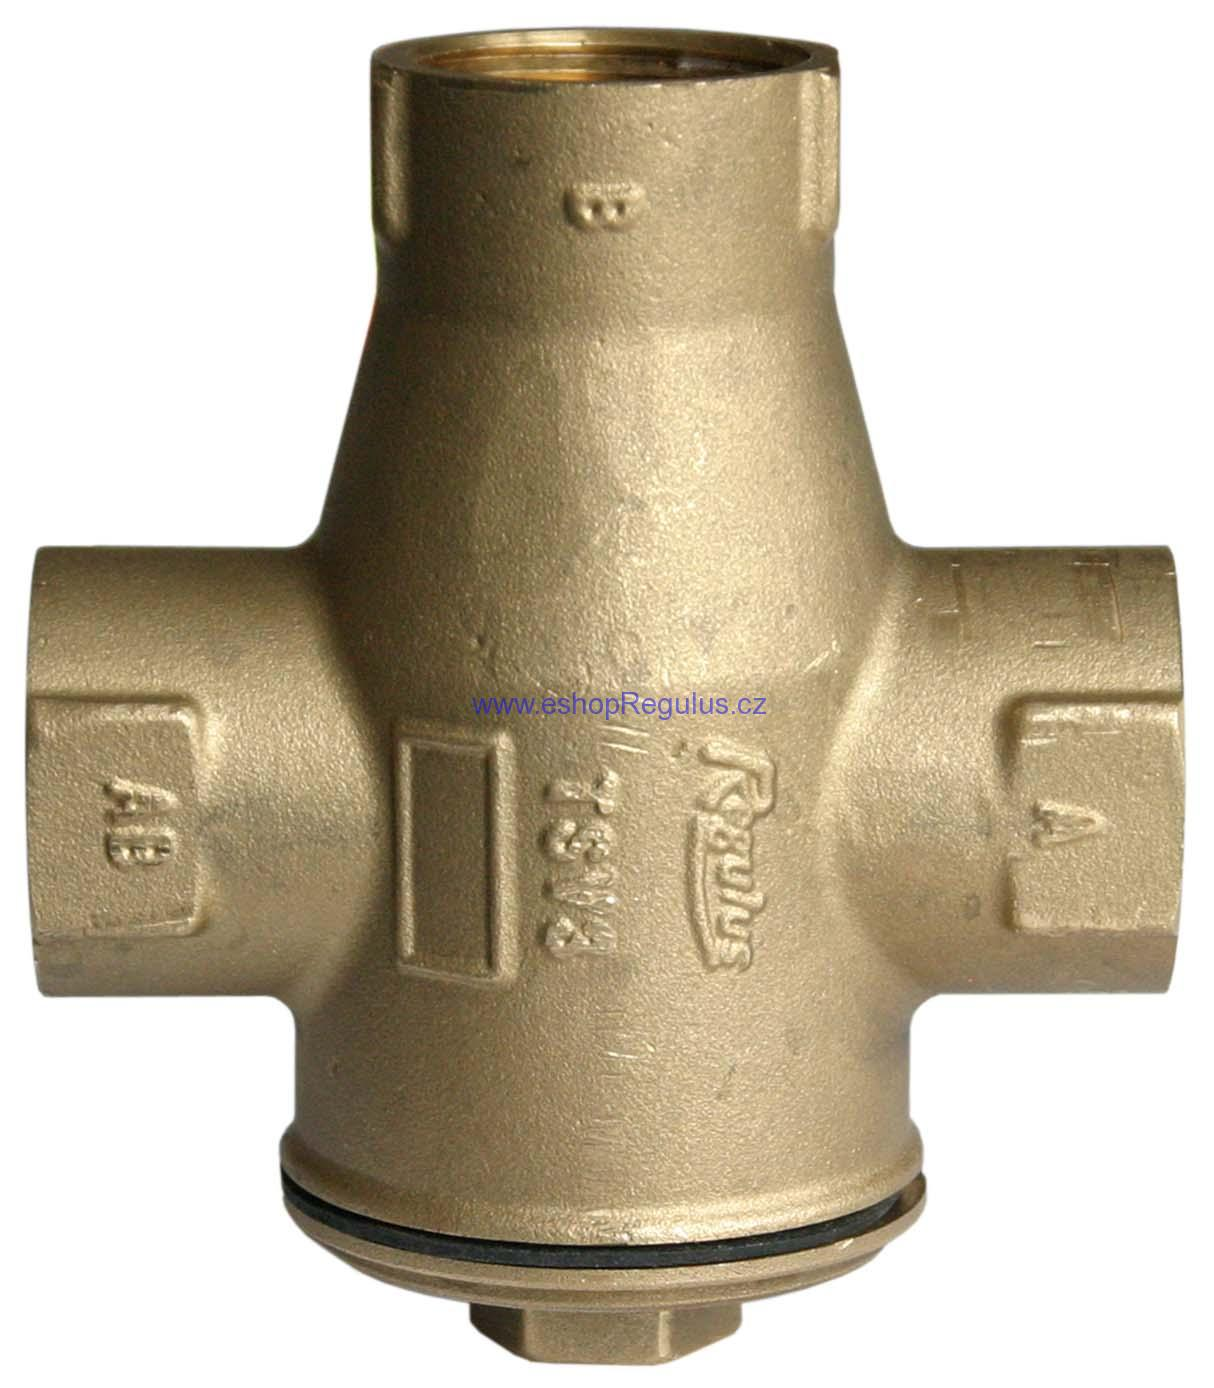 Termostatický ventil TSV3 77°C - pro kotle Atmos